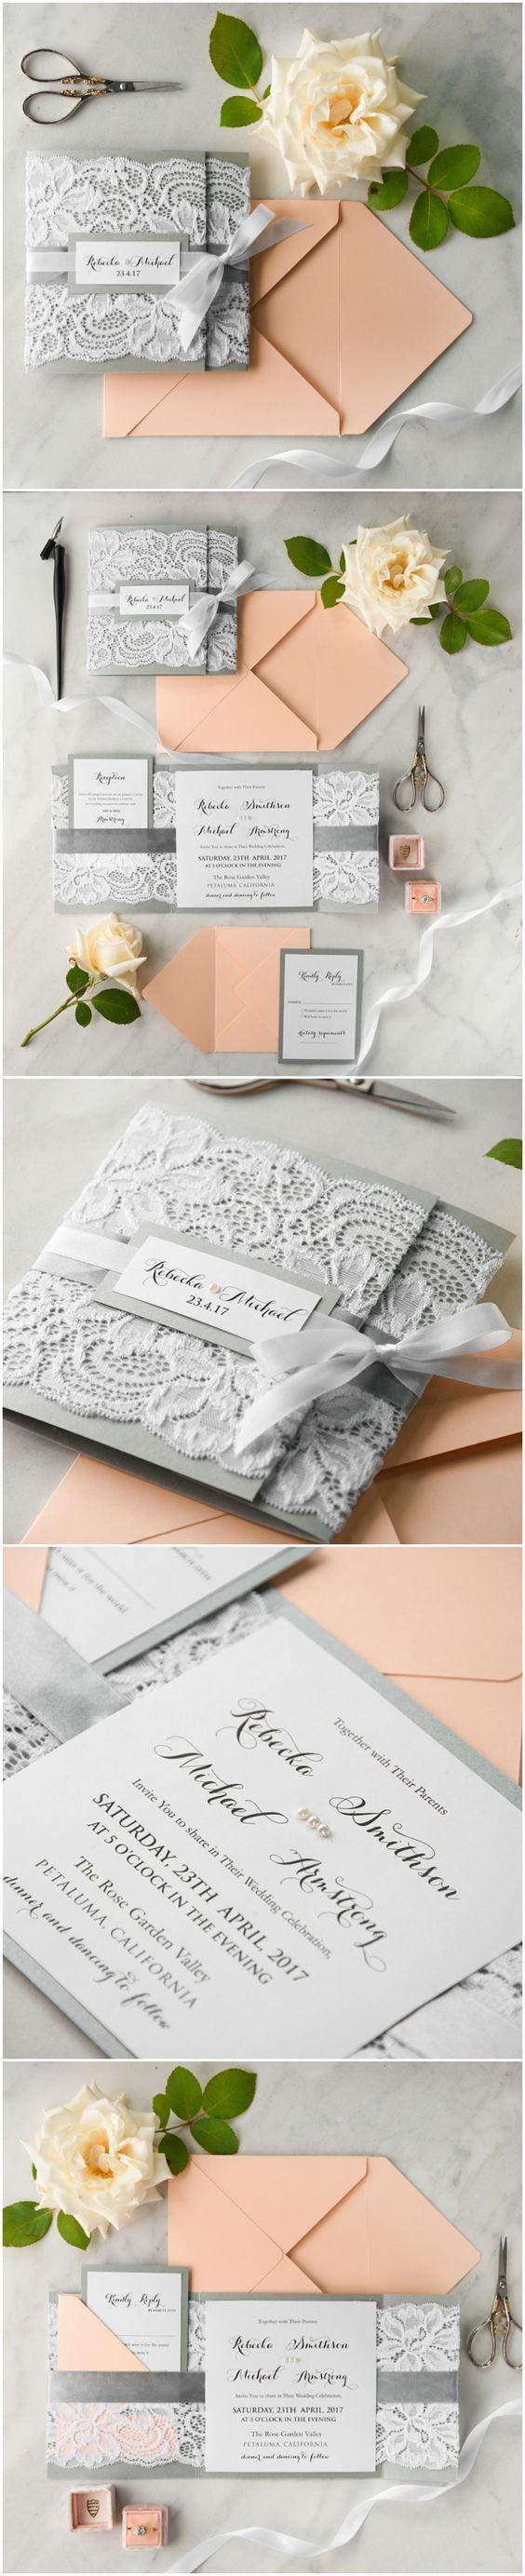 15 best Wedding invitations images on Pinterest | Card wedding ...